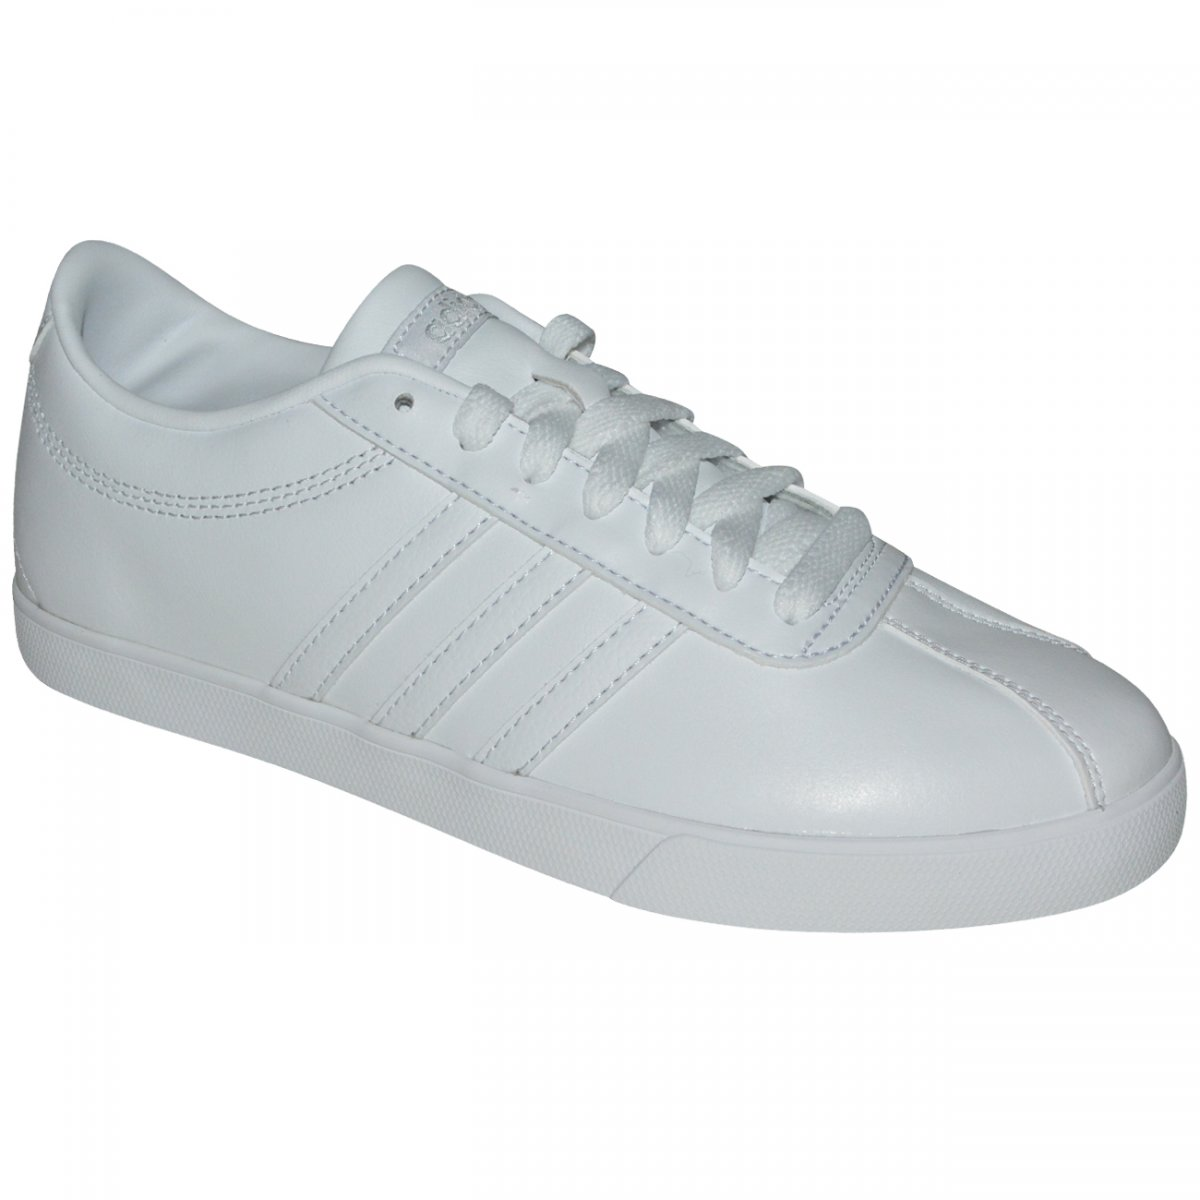 de0af47b7 Tenis Adidas Courtset W BB9659 - Branco/Branco - Chuteira Nike, Adidas.  Sandalias Femininas. Sandy Calçados